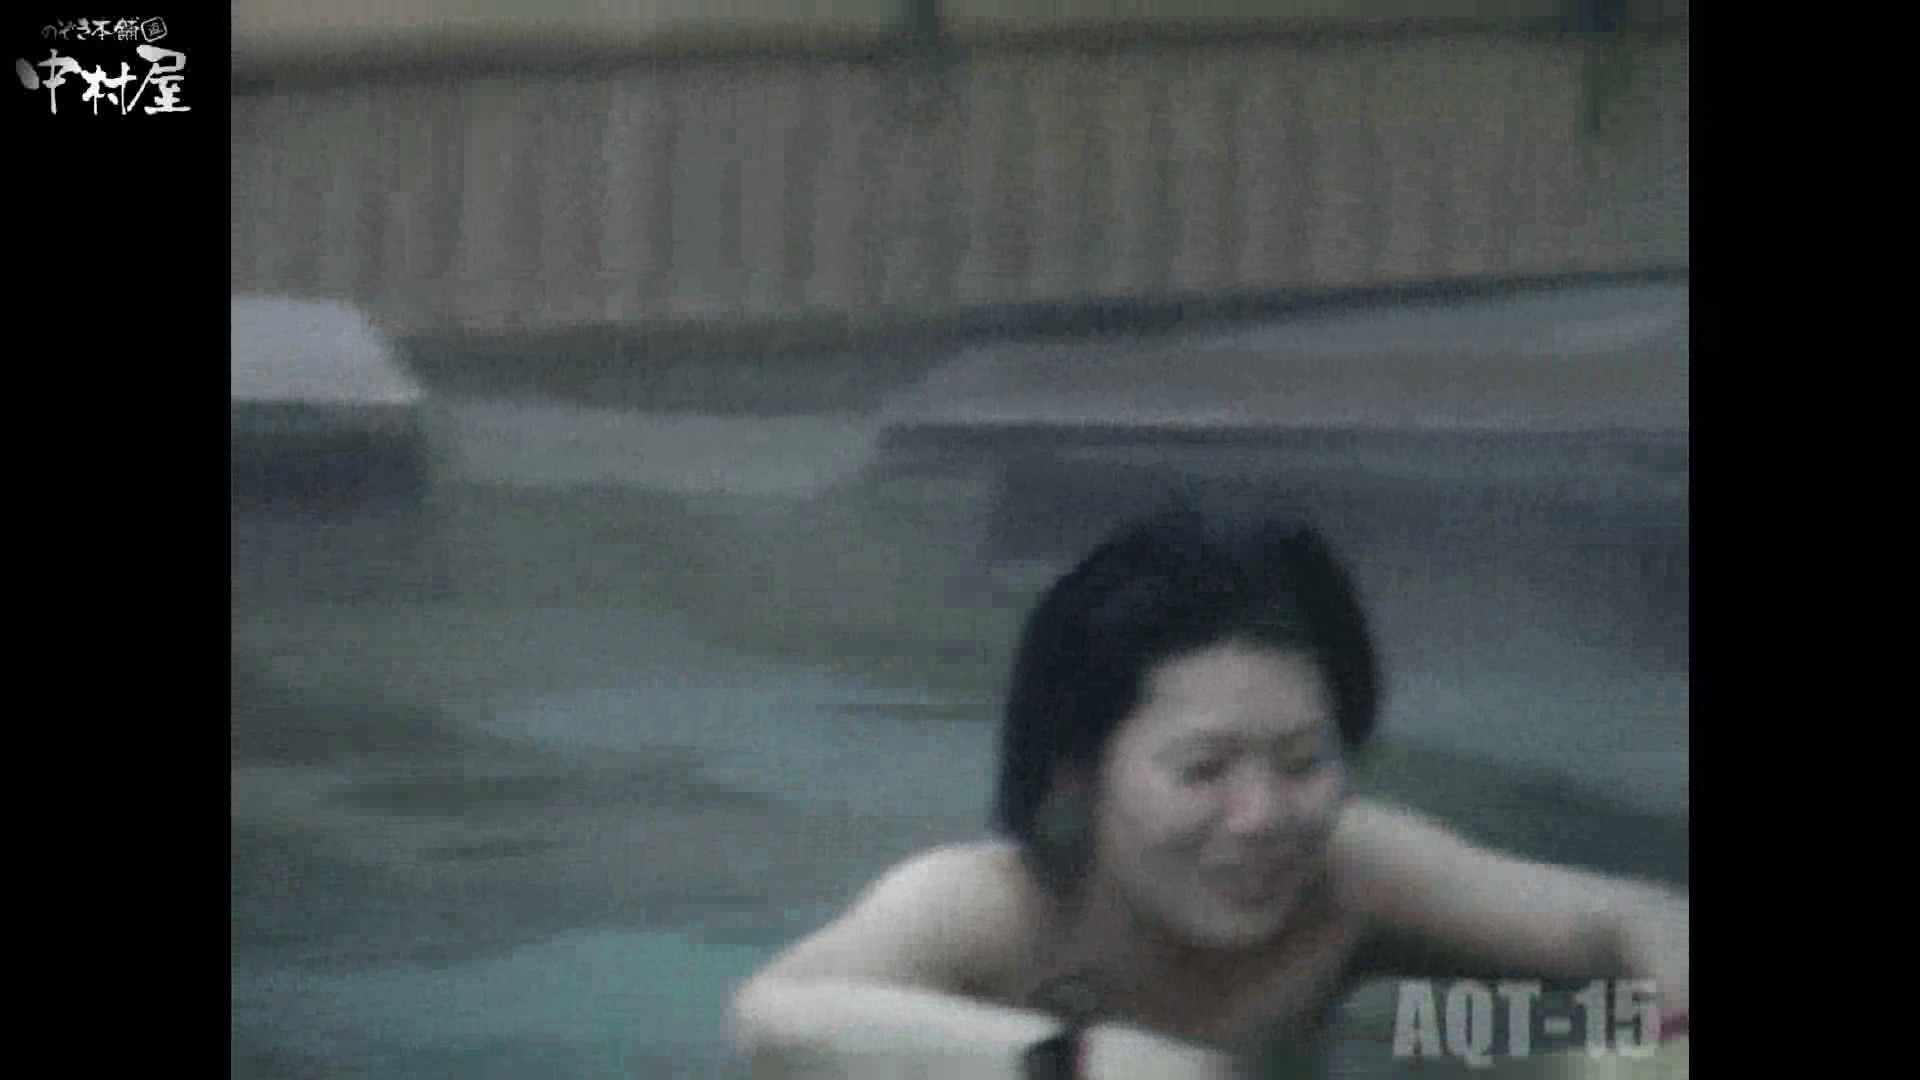 Aquaな露天風呂Vol.878潜入盗撮露天風呂十五判湯 其の七 盗撮シリーズ エロ画像 97PIX 56